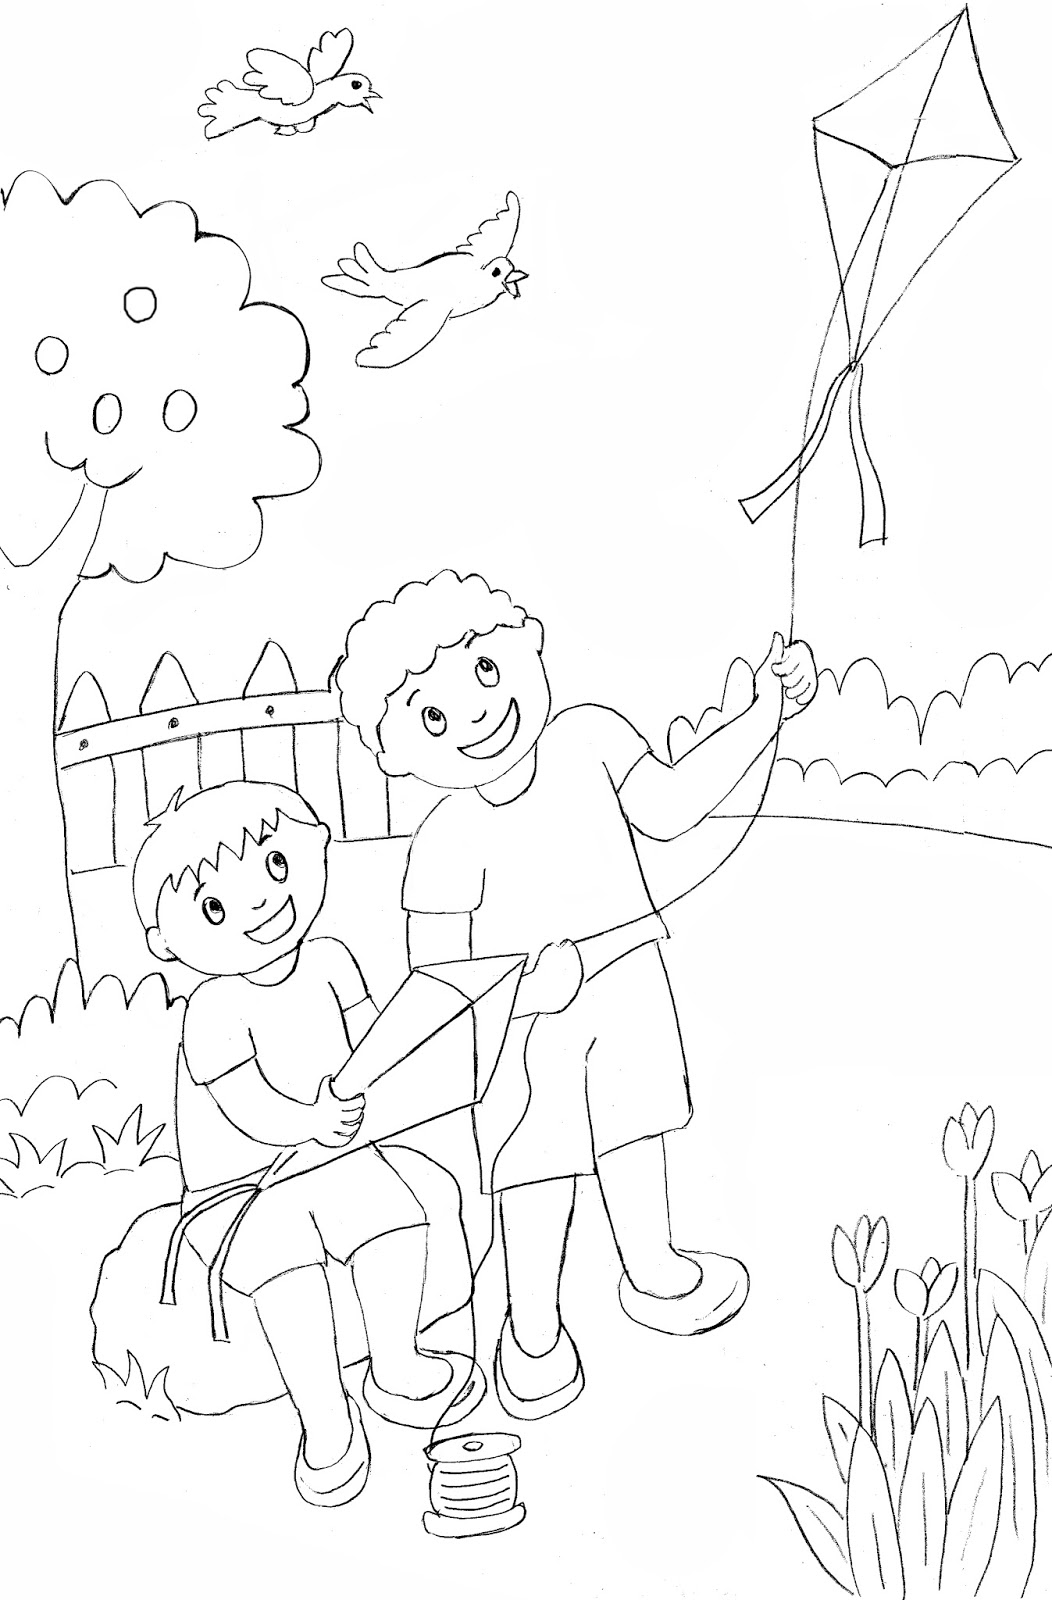 Contoh Gambar Gambar Mewarnai Anak Anak Bermain - KataUcap